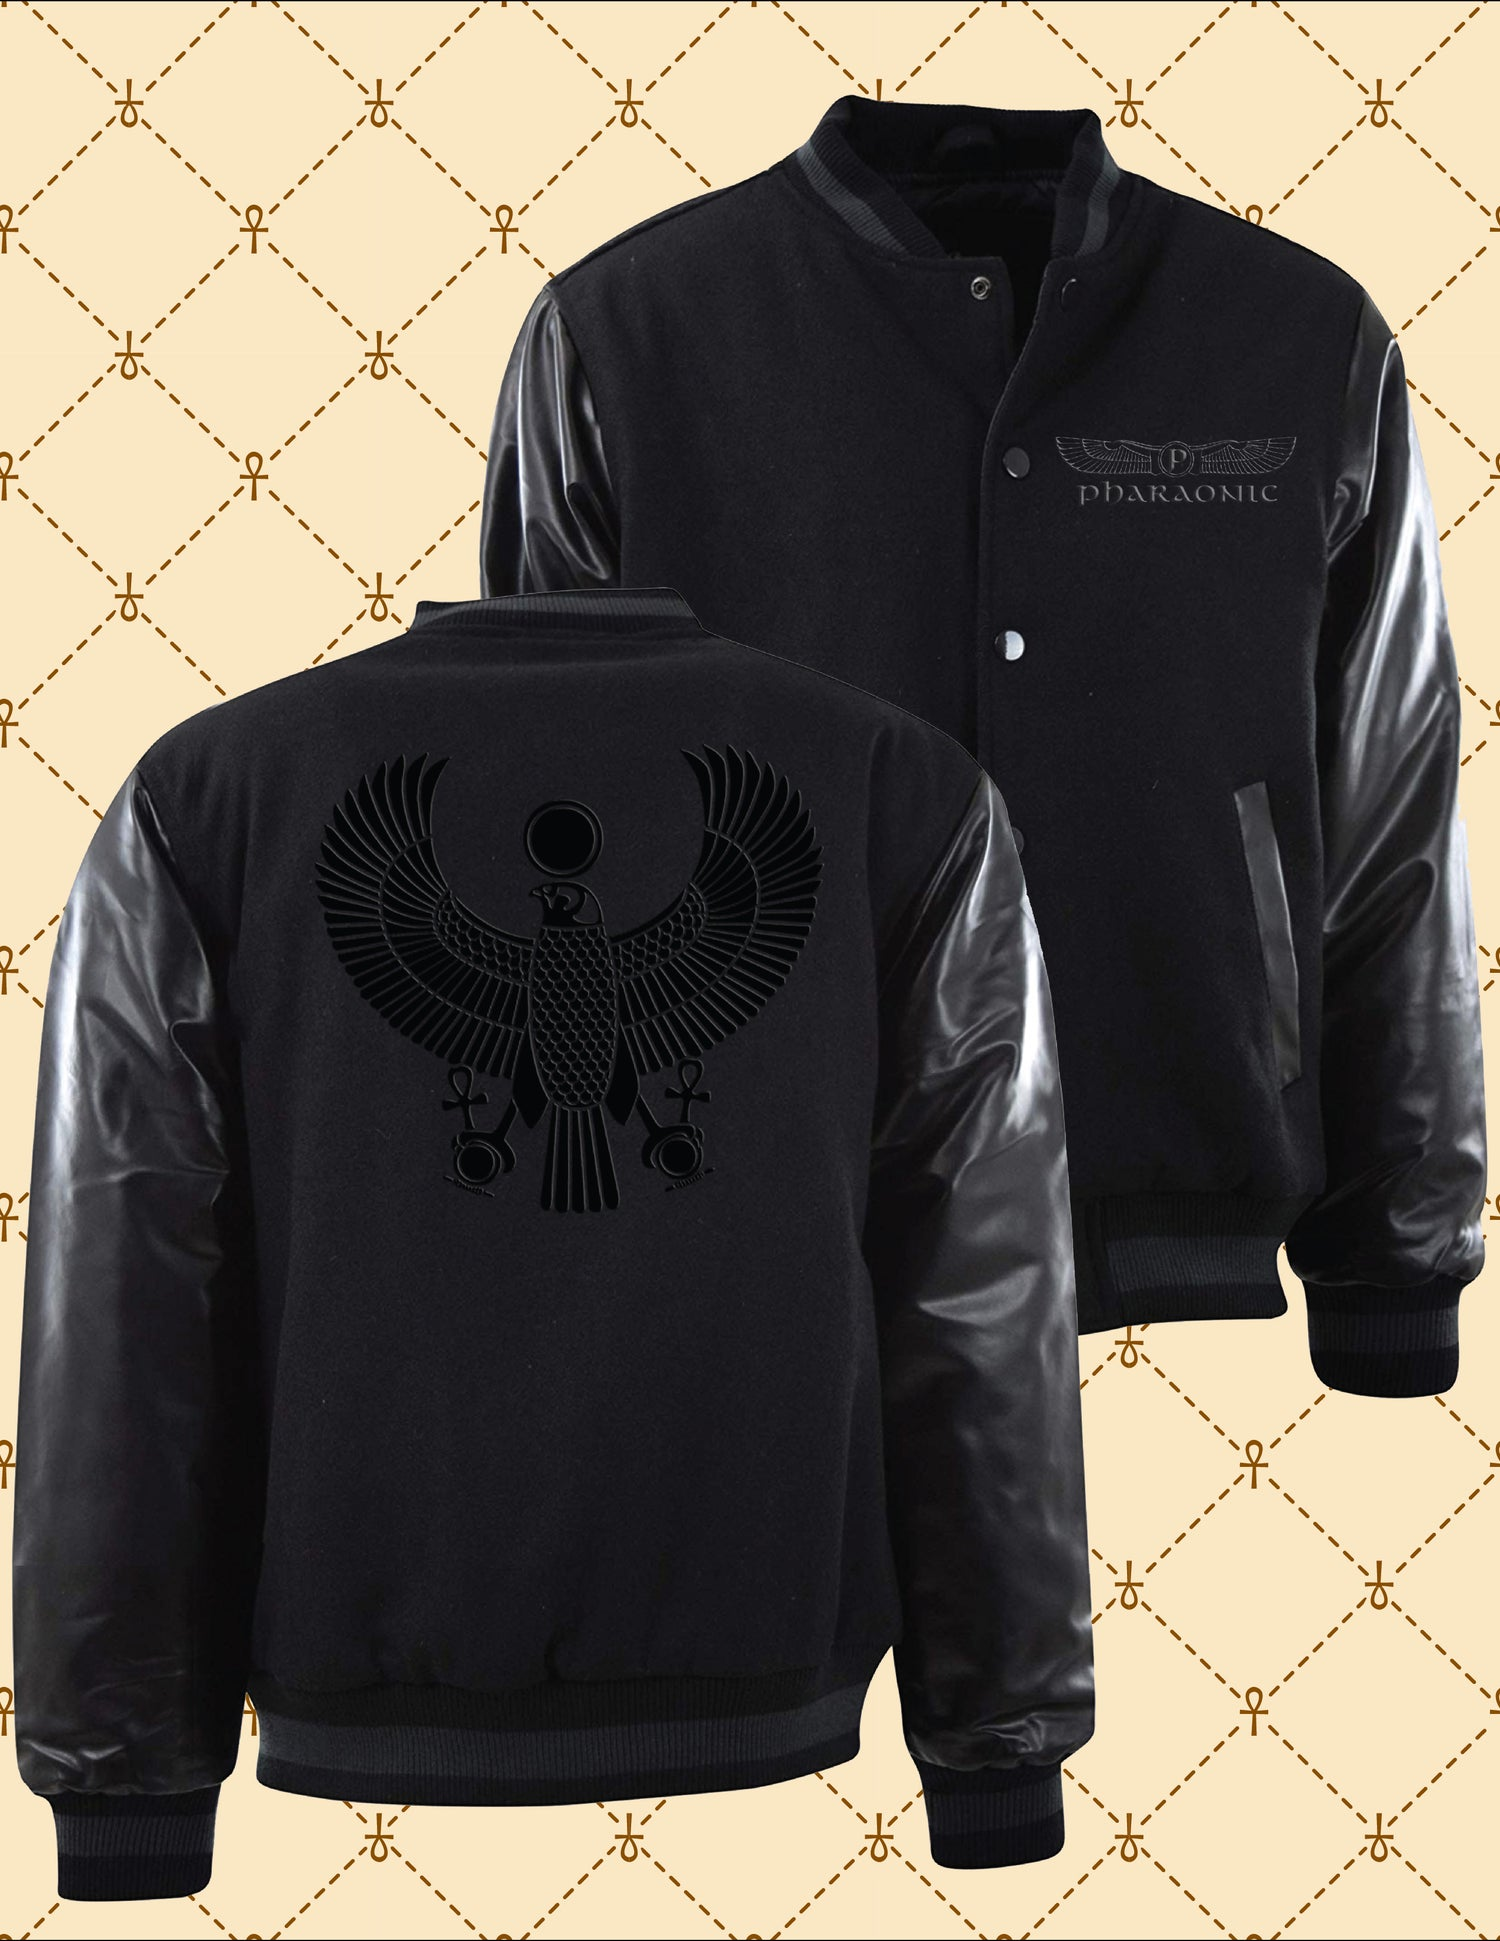 Image of Black on Black HRU Varsity Jacket